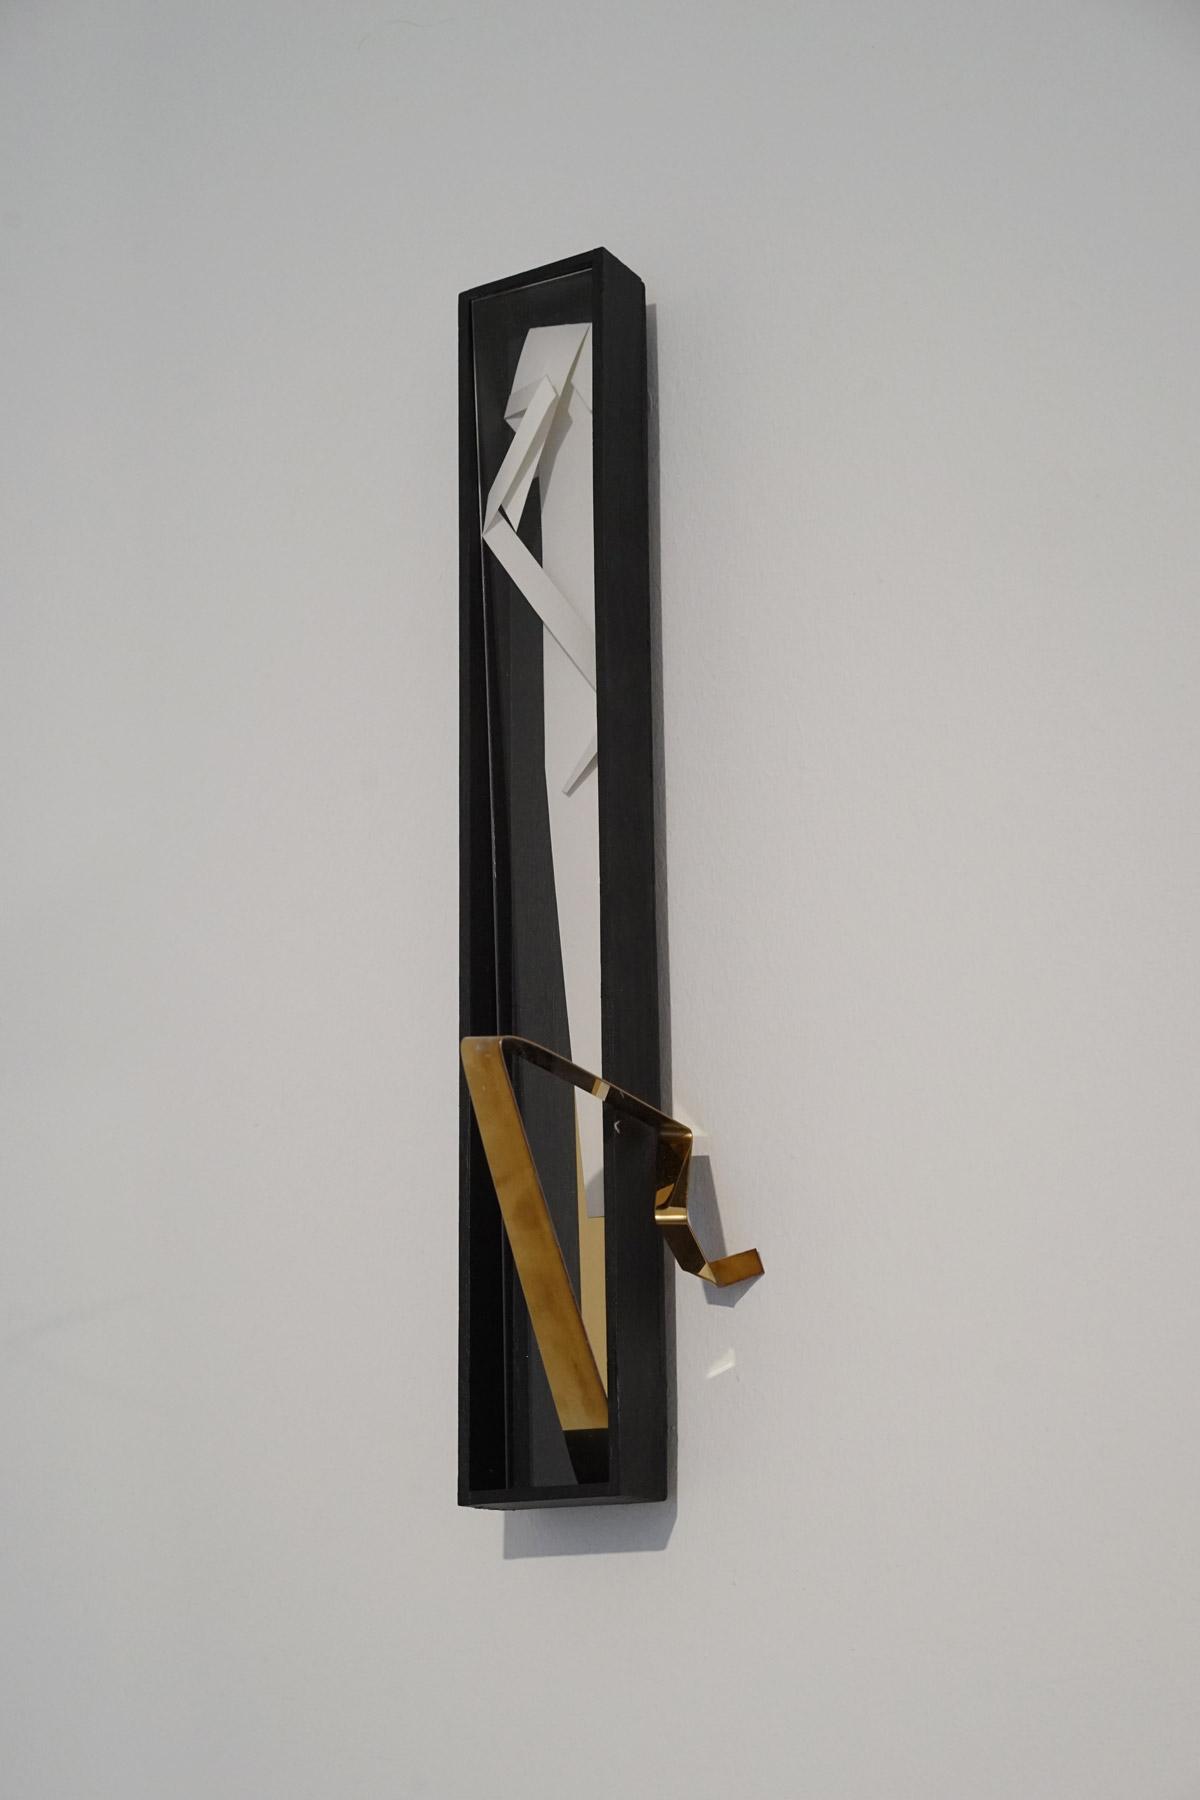 Nina Annabelle Märkl | Line and Space 3 | Ink on folded paper, wood, polished steel | 44 x 12 x 10 cm | 2017